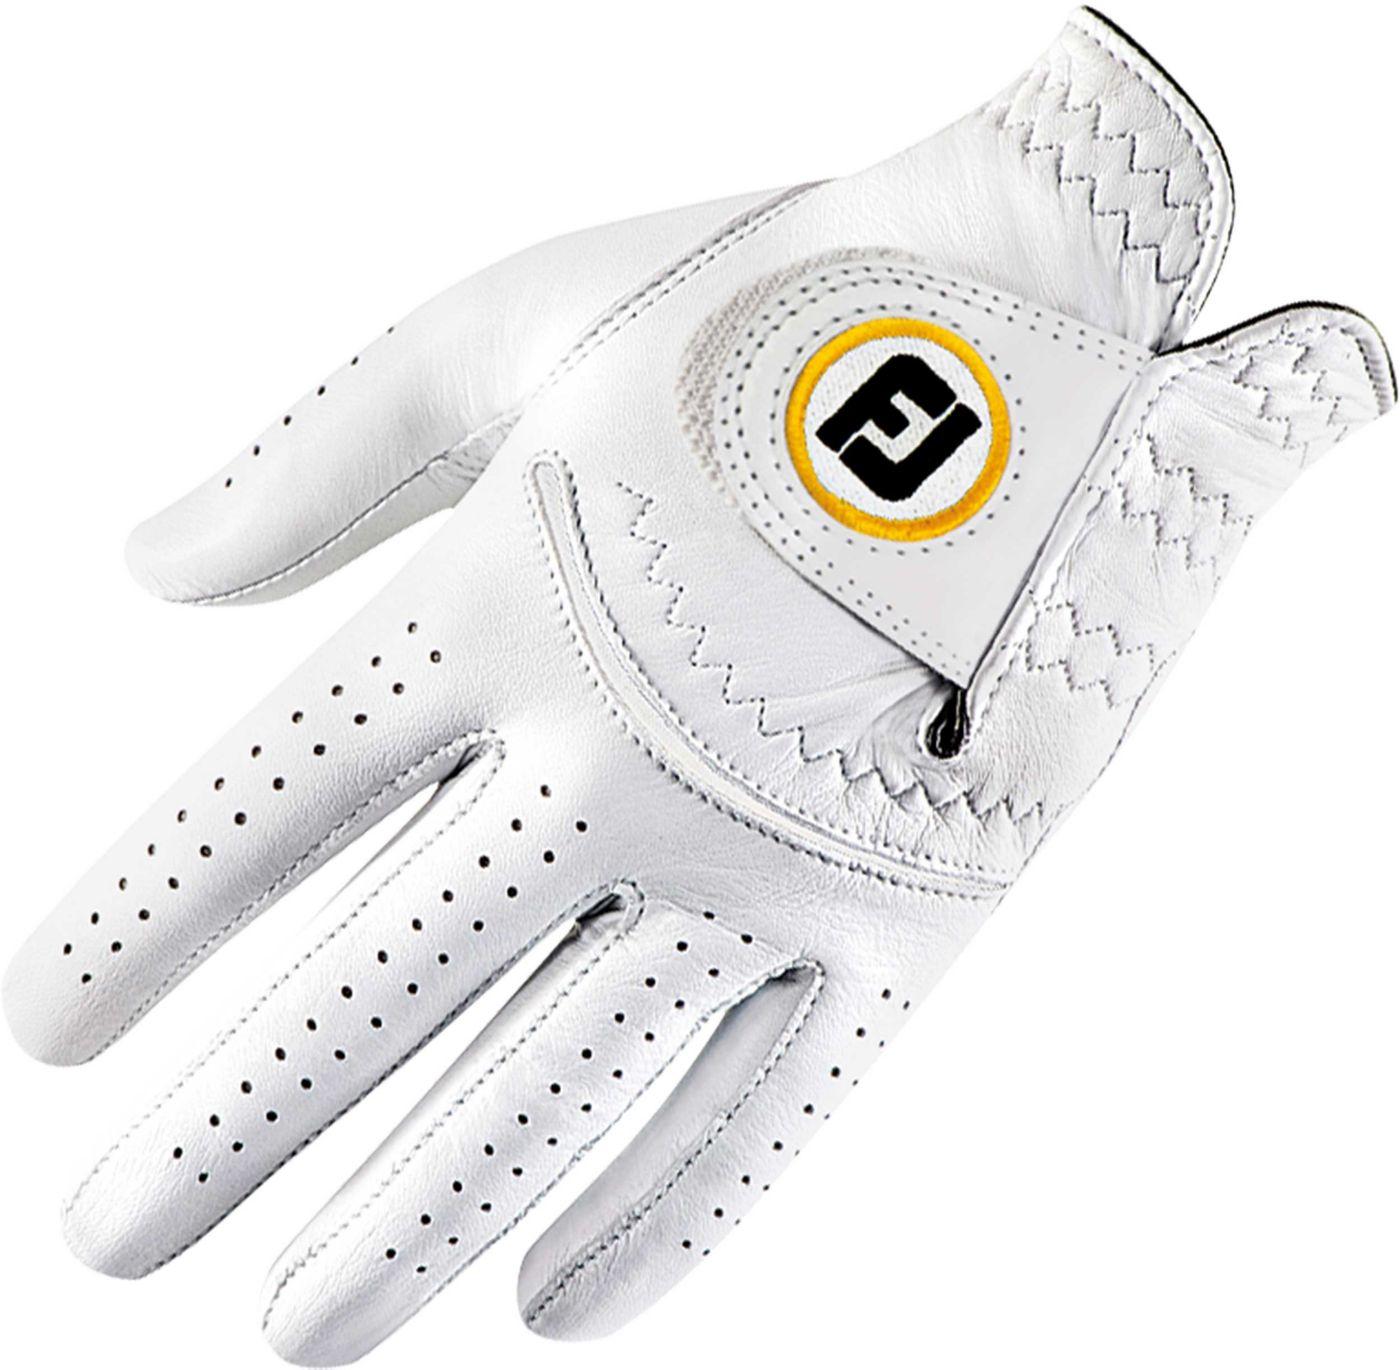 FootJoy Women's StaSof Golf Glove - Prior Generation